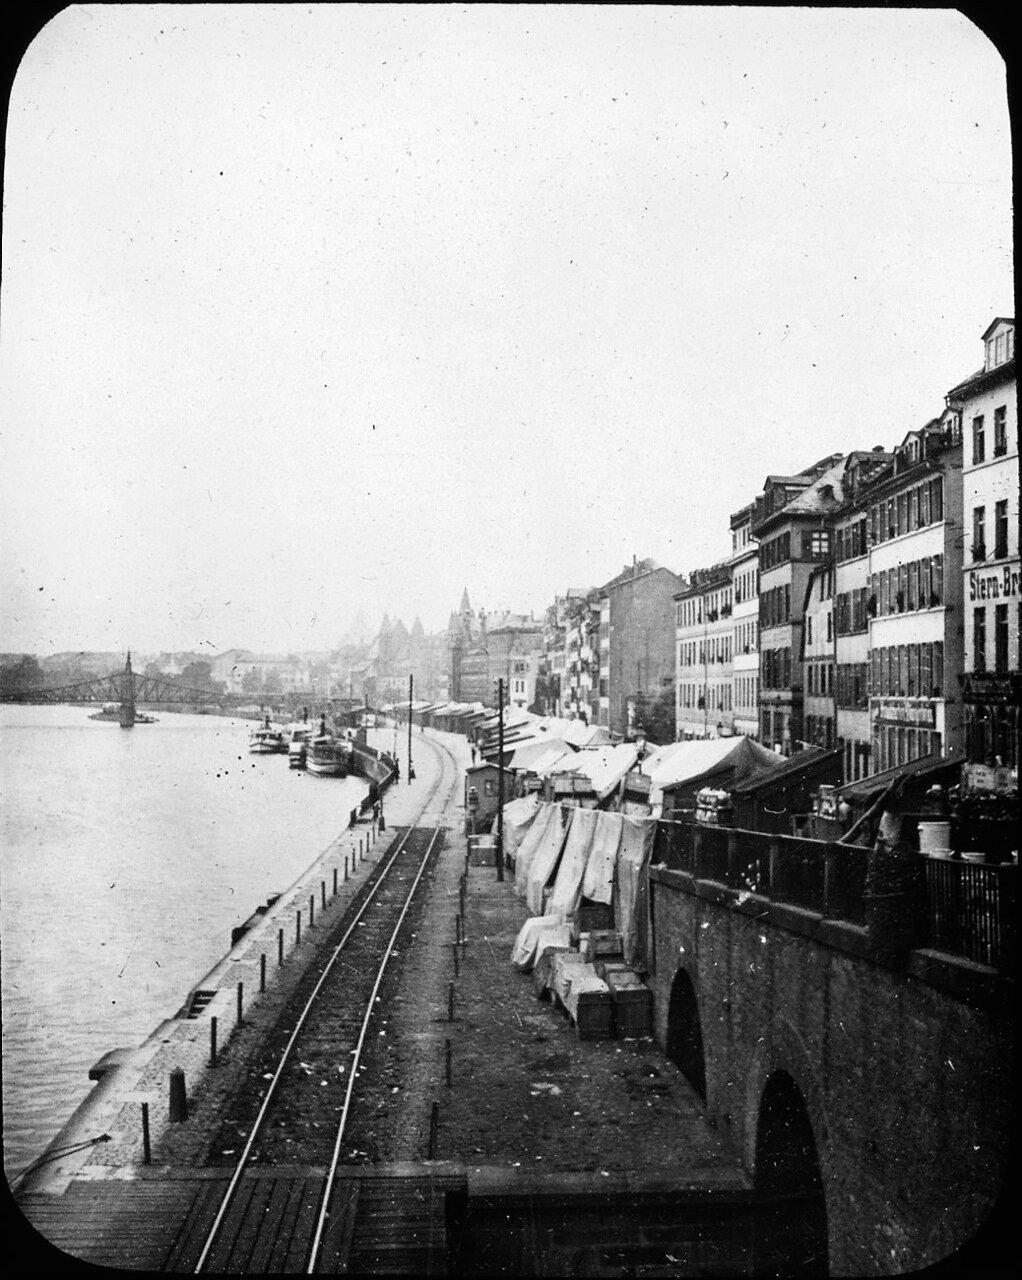 Франкфурт. Река Майн. 1907